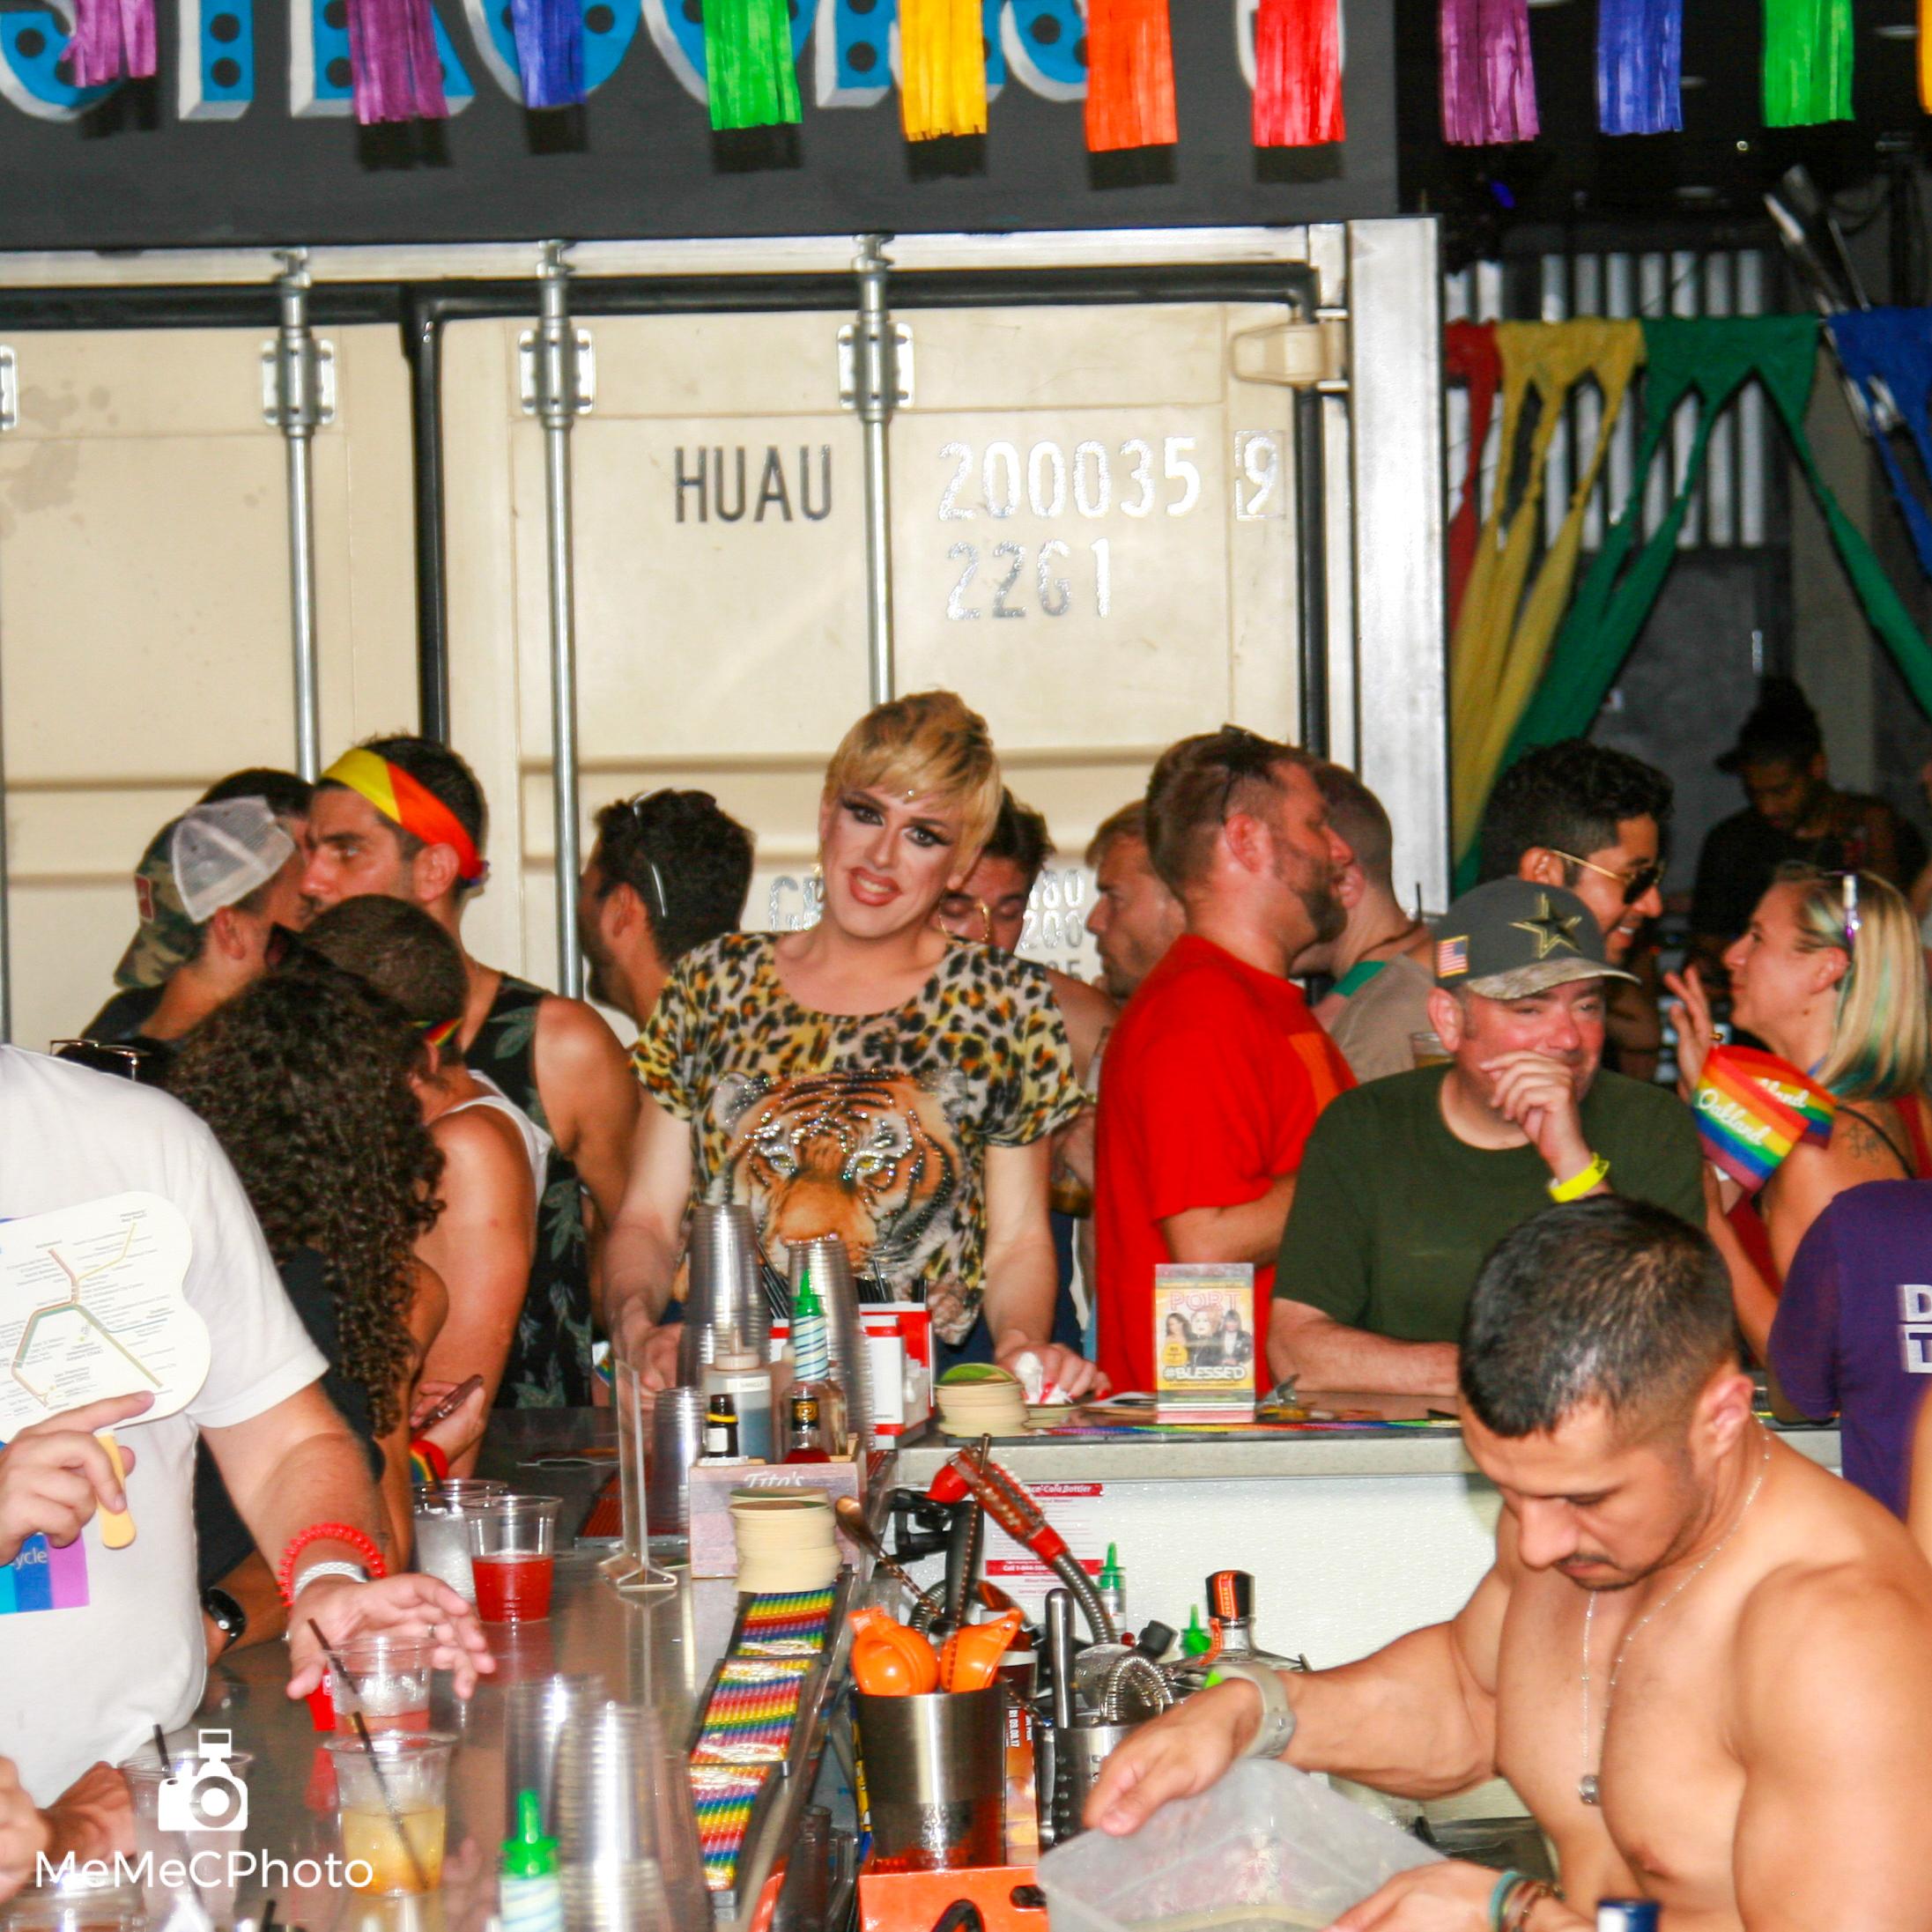 Port Bar Oakland Pride - 157-144.jpg